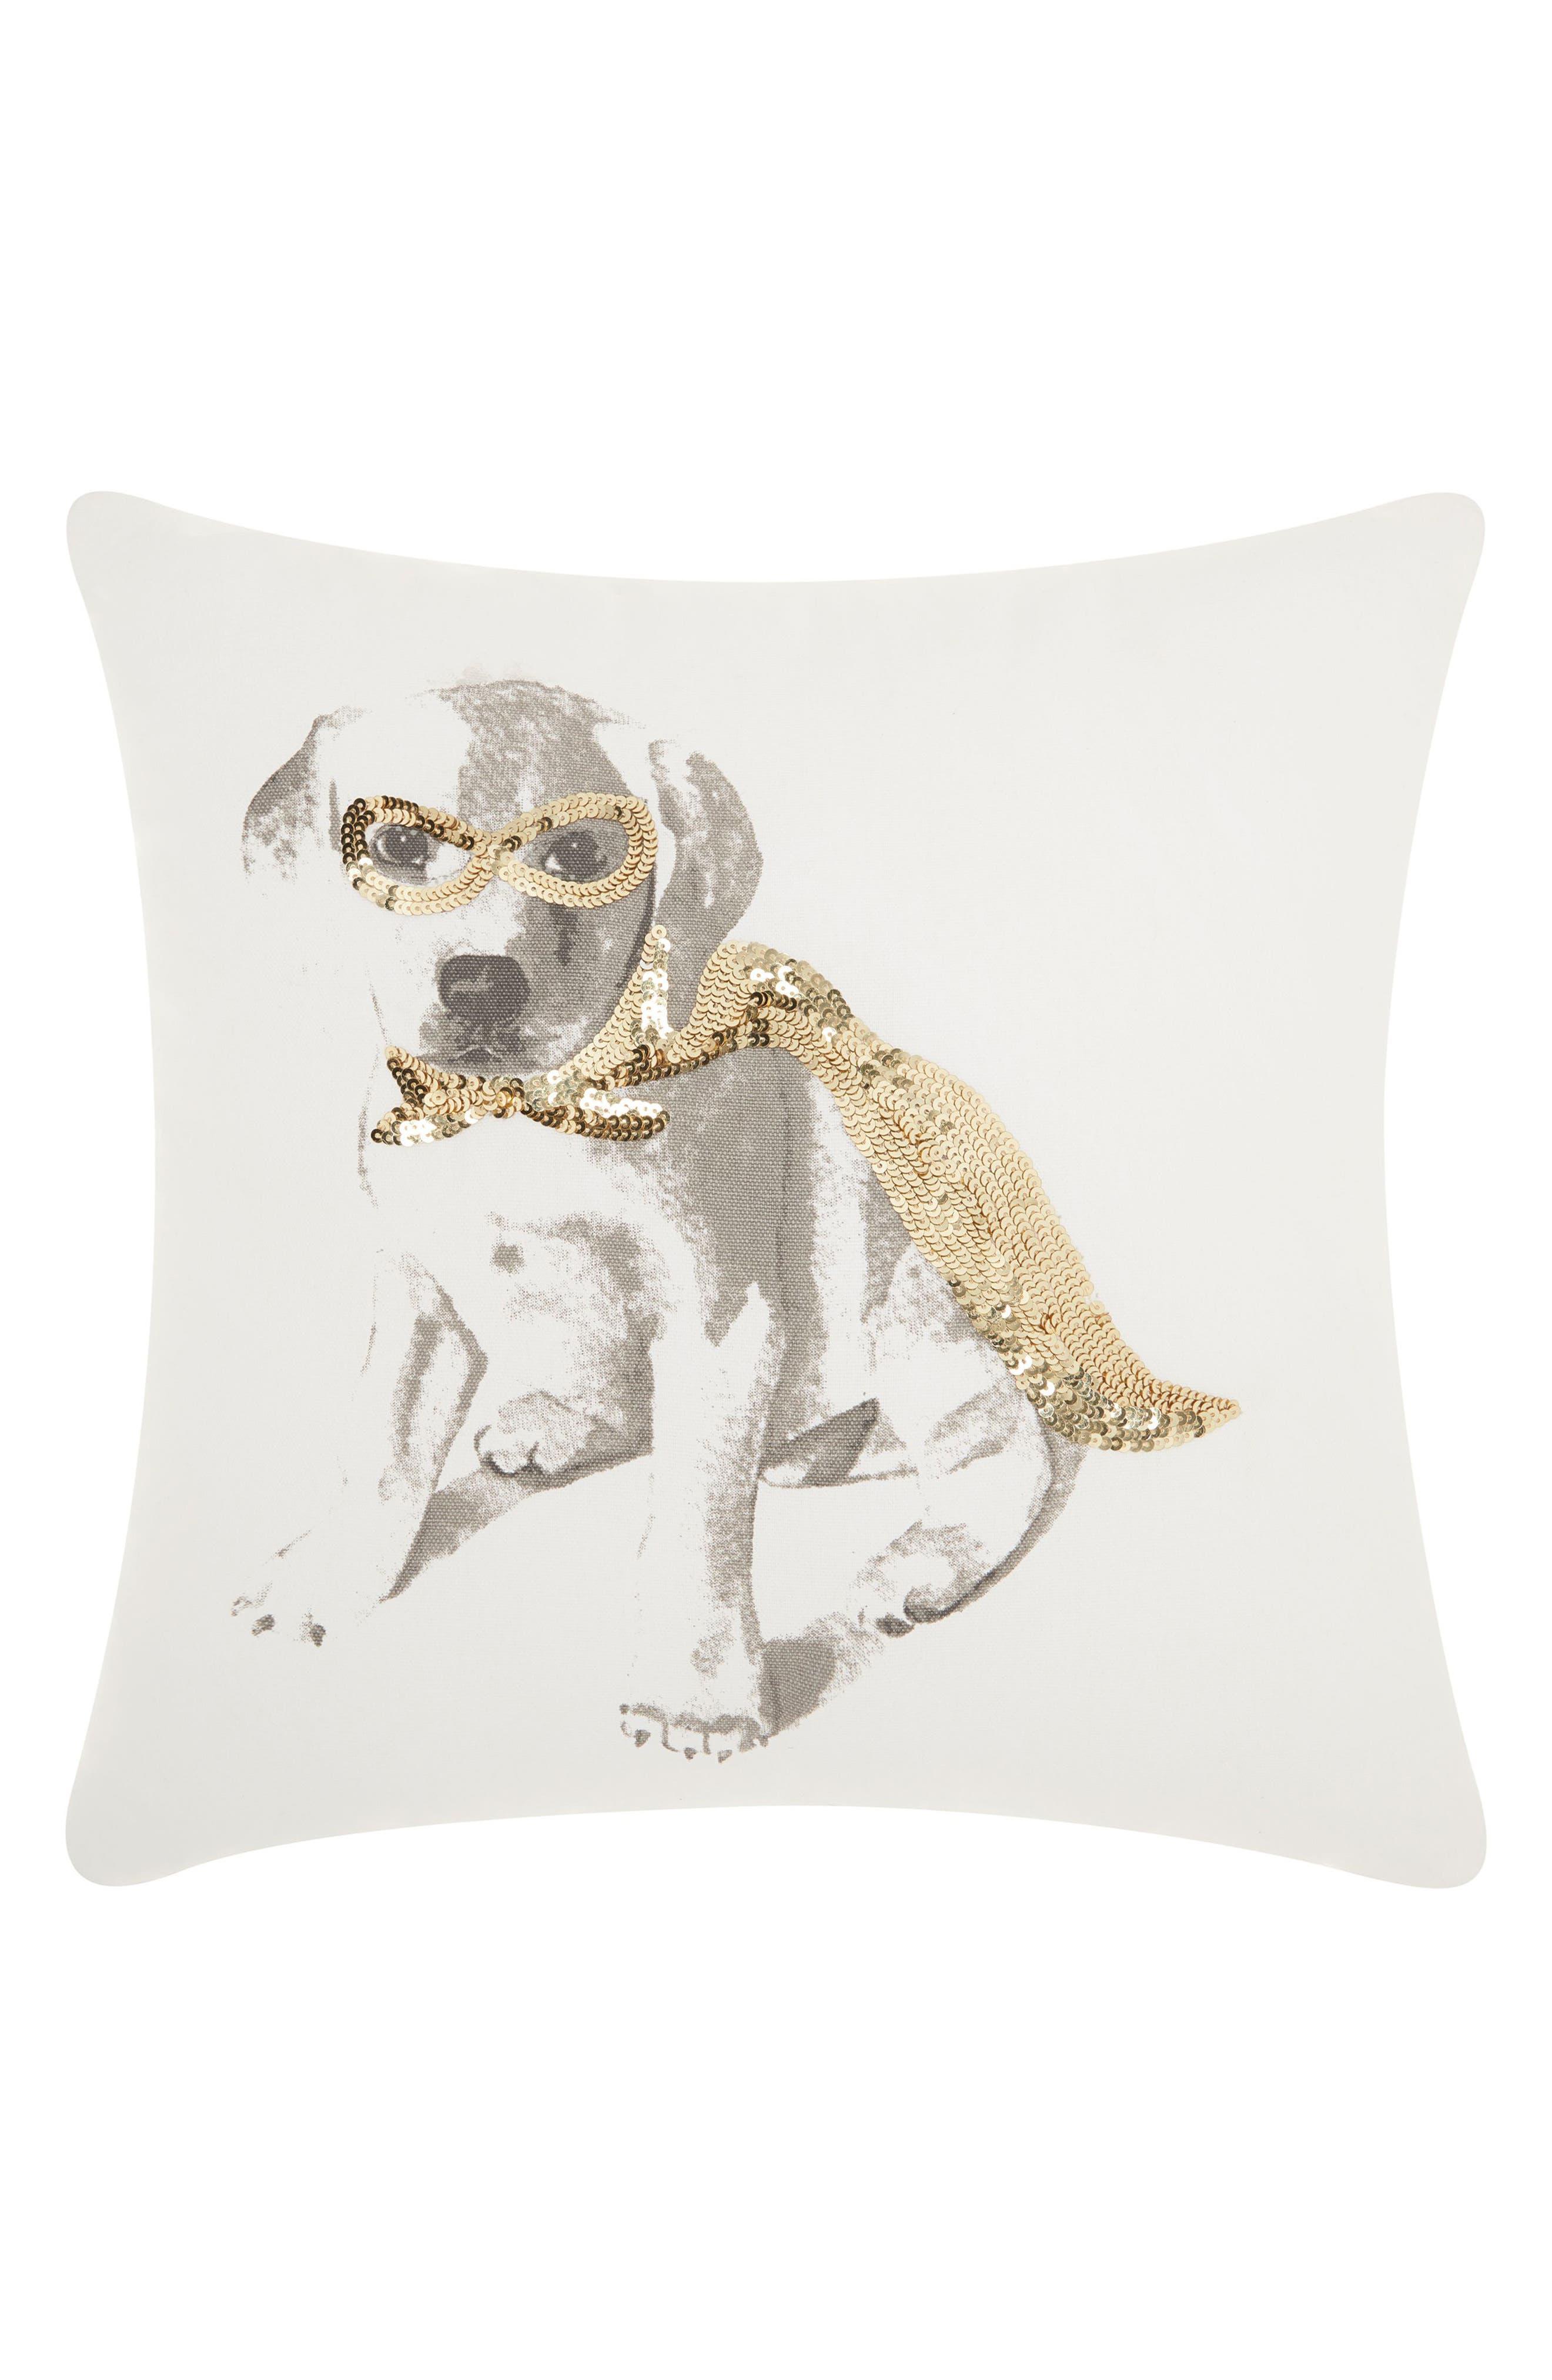 Sequin Super Dog Accent Pillow,                             Main thumbnail 1, color,                             100